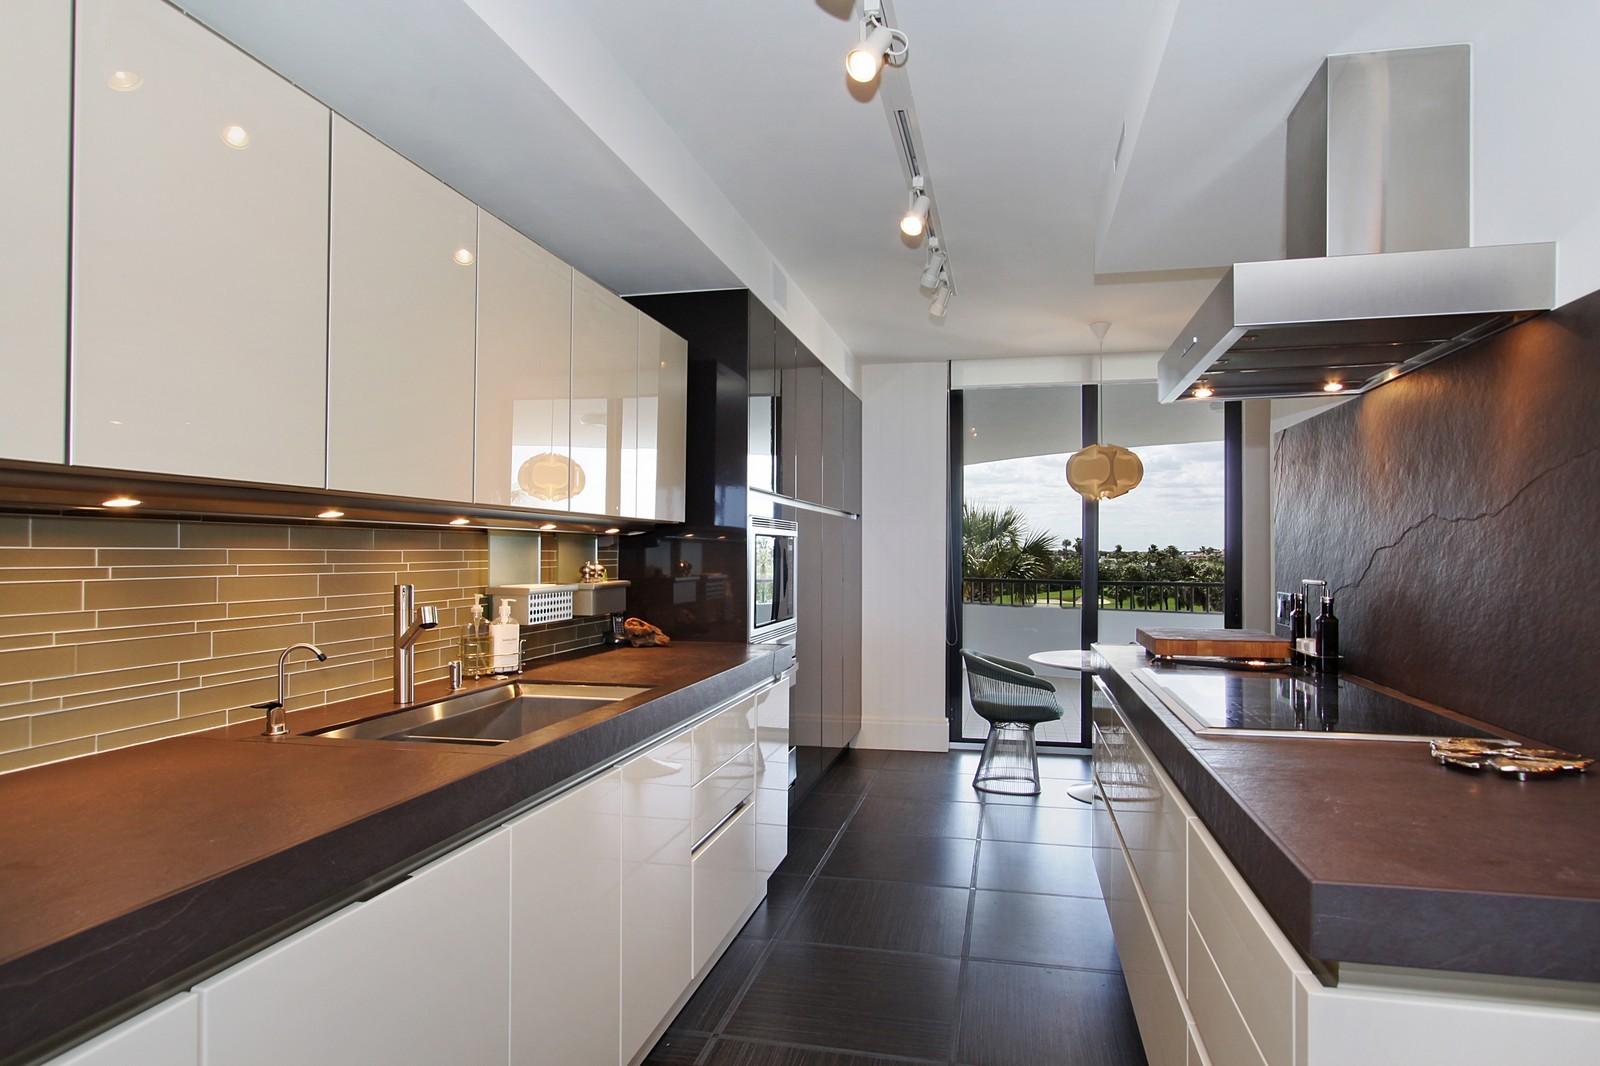 Real Estate Photography - 2001 SE Sailfish Point Blvd, Unit 318, Stuart, FL, 34996 - Kitchen